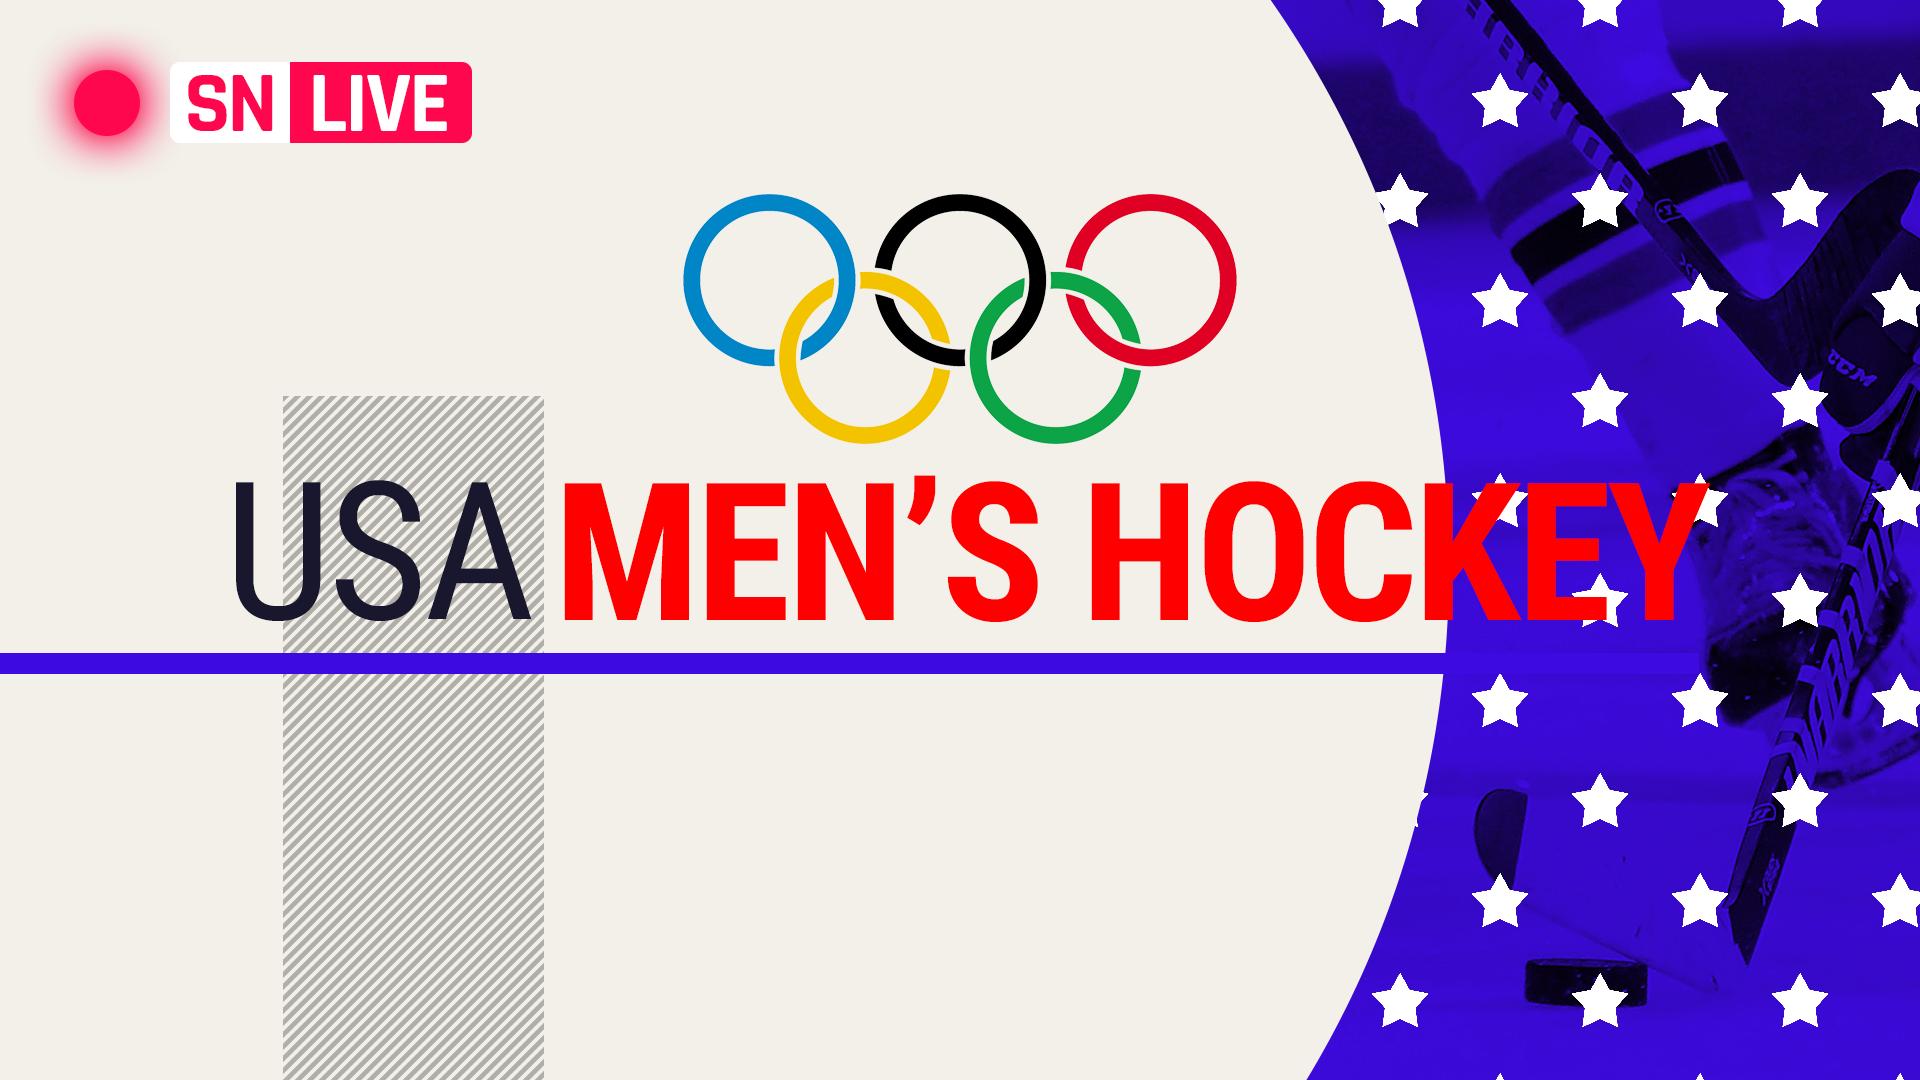 Kovalchuk scores twice to help Russians outclass U.S., 4-0, at Olympics